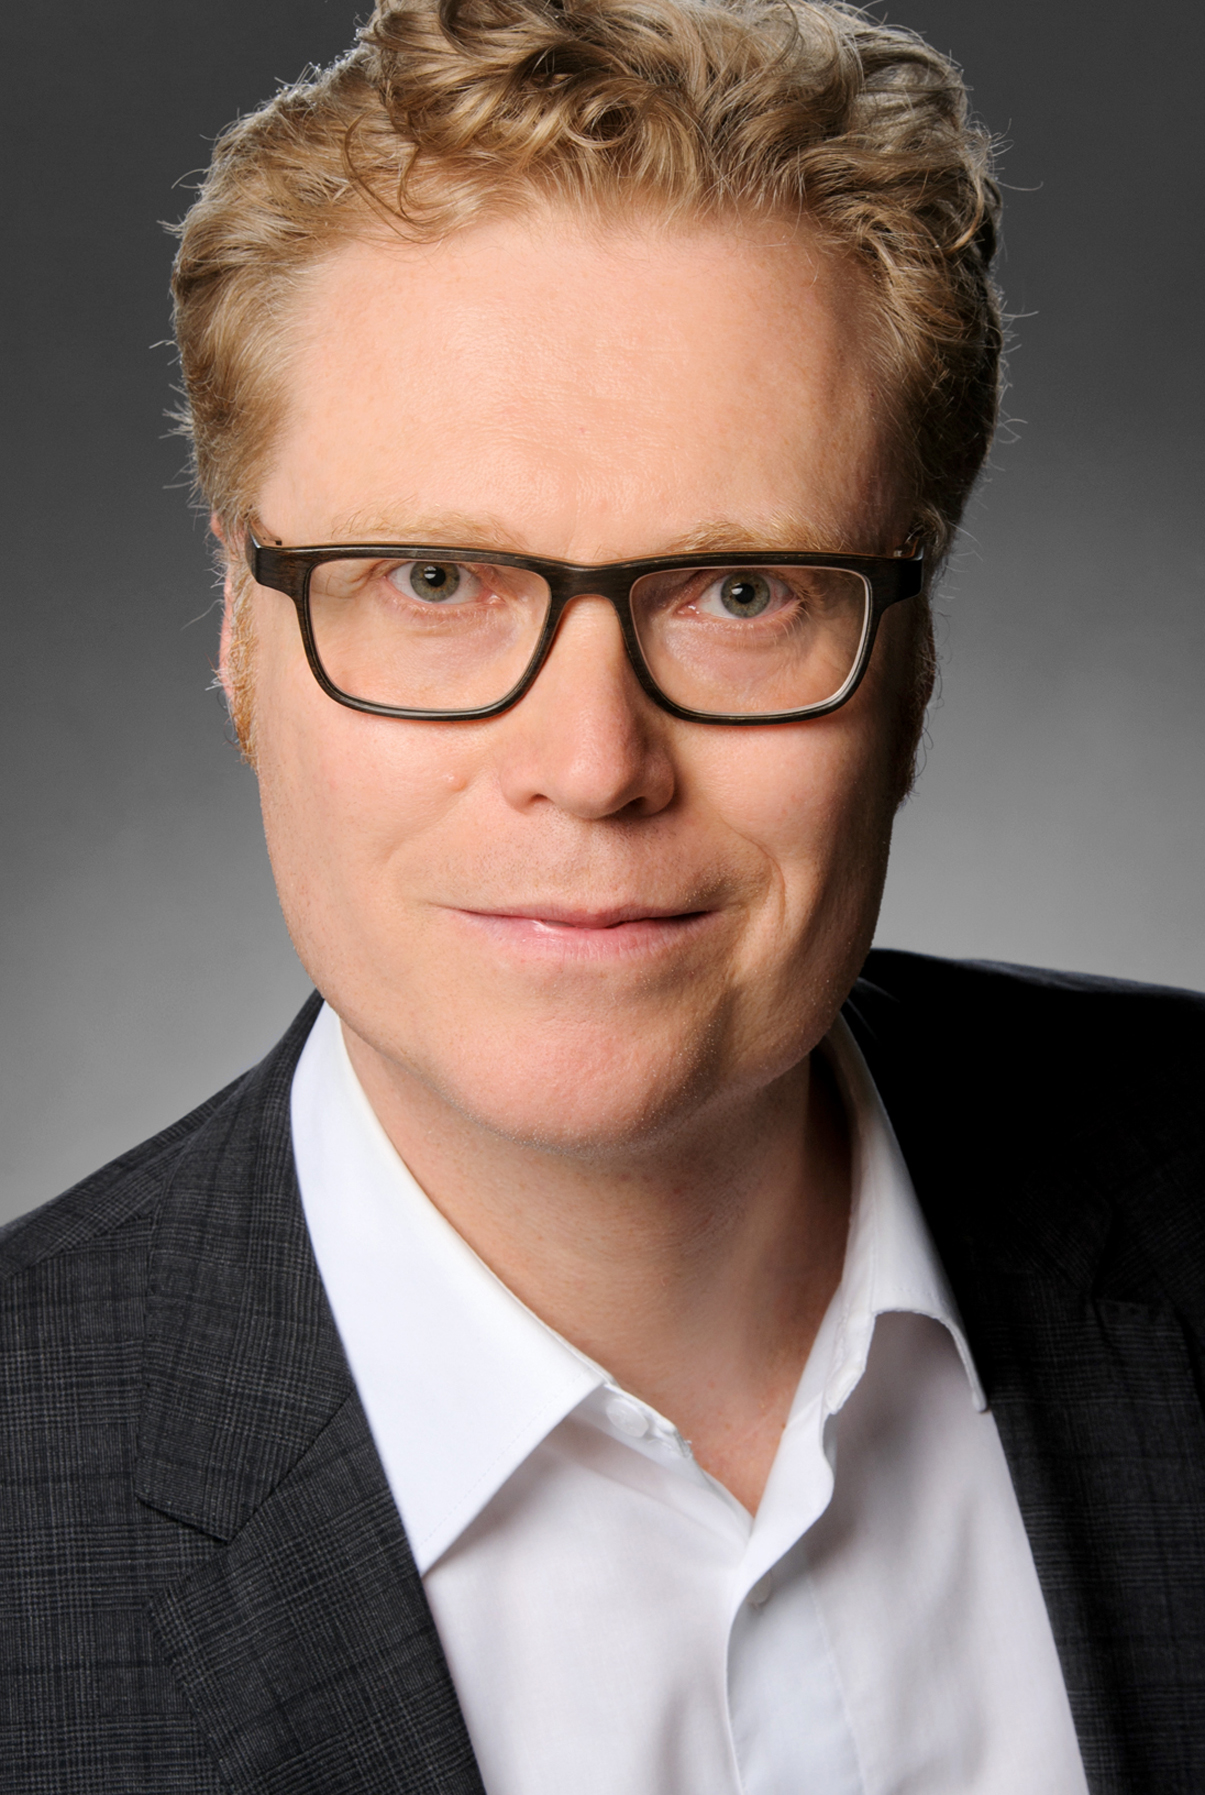 Prof. Dr. med. Nils Schneider